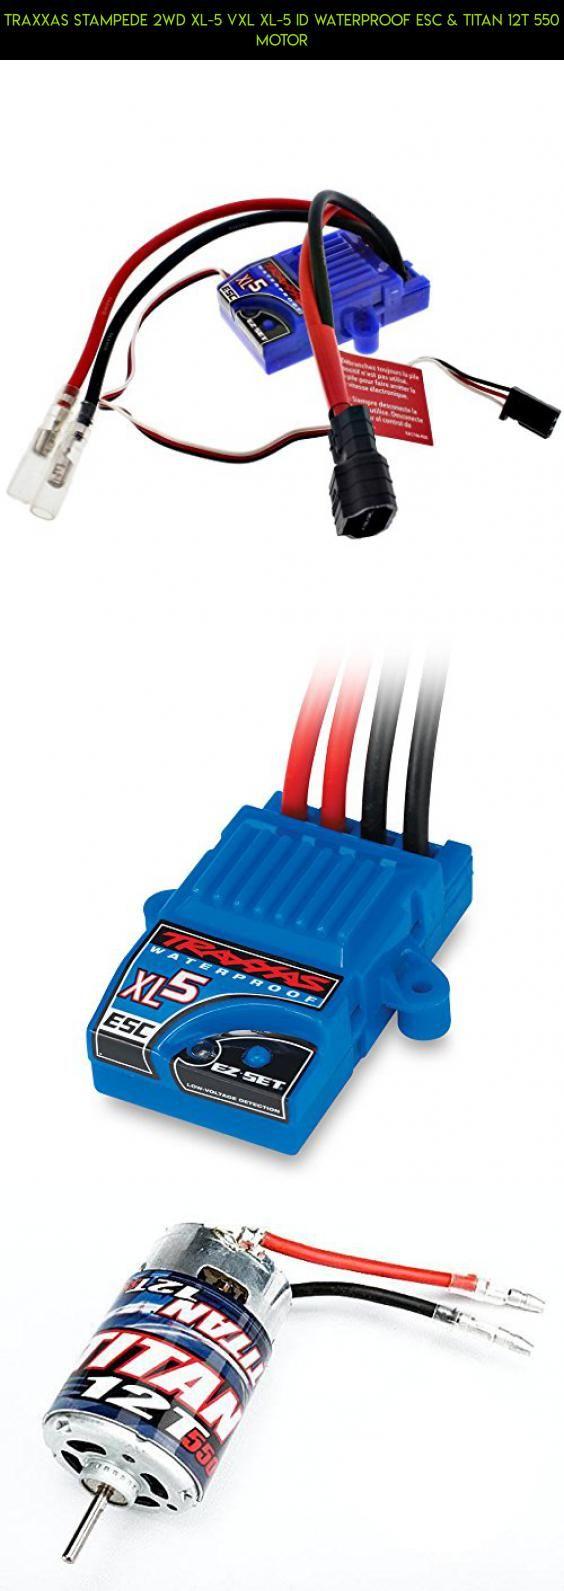 Traxxas Stampede 2wd XL-5 VXL XL-5 iD WATERPROOF ESC & TITAN 12T 550 Motor #drone #tech #shopping #550 #traxxas #kit #technology #gadgets #12t #motor #parts #fpv #titan #racing #plans #camera #products